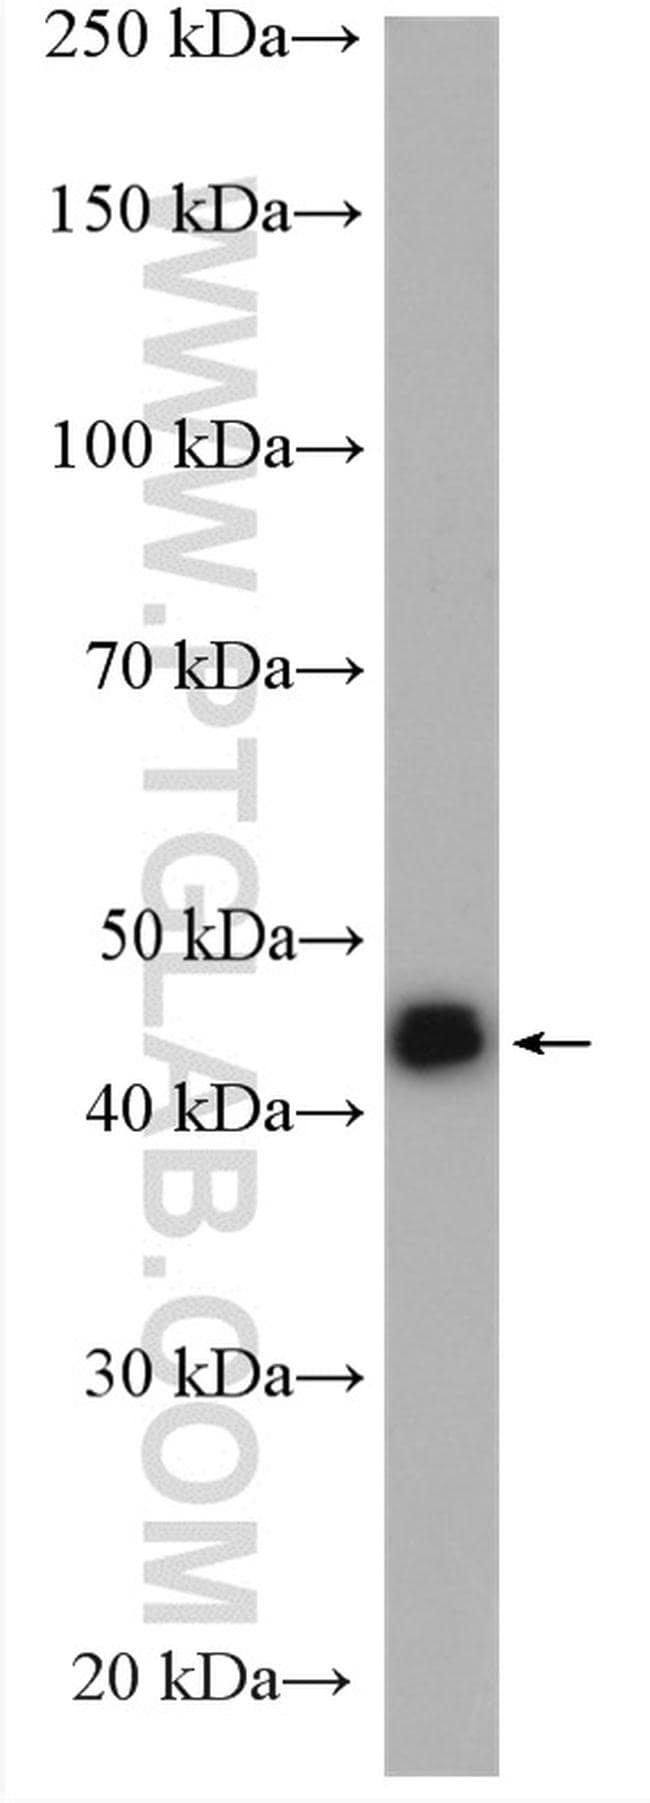 PIP4K2C Antibody in Western Blot (WB)